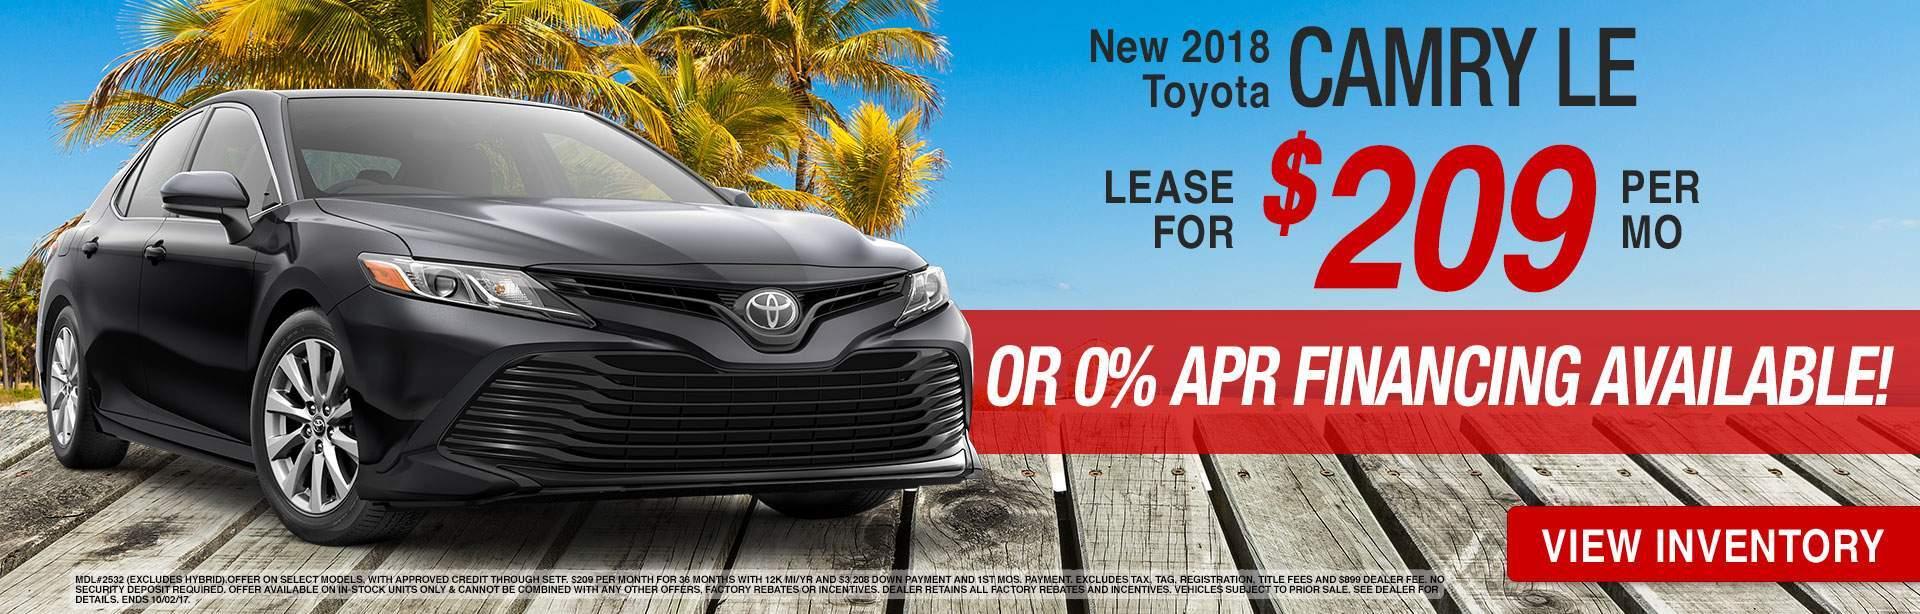 Hybrid Rebates West Kendall Toyota New Used Toyota Dealership Serving Miami